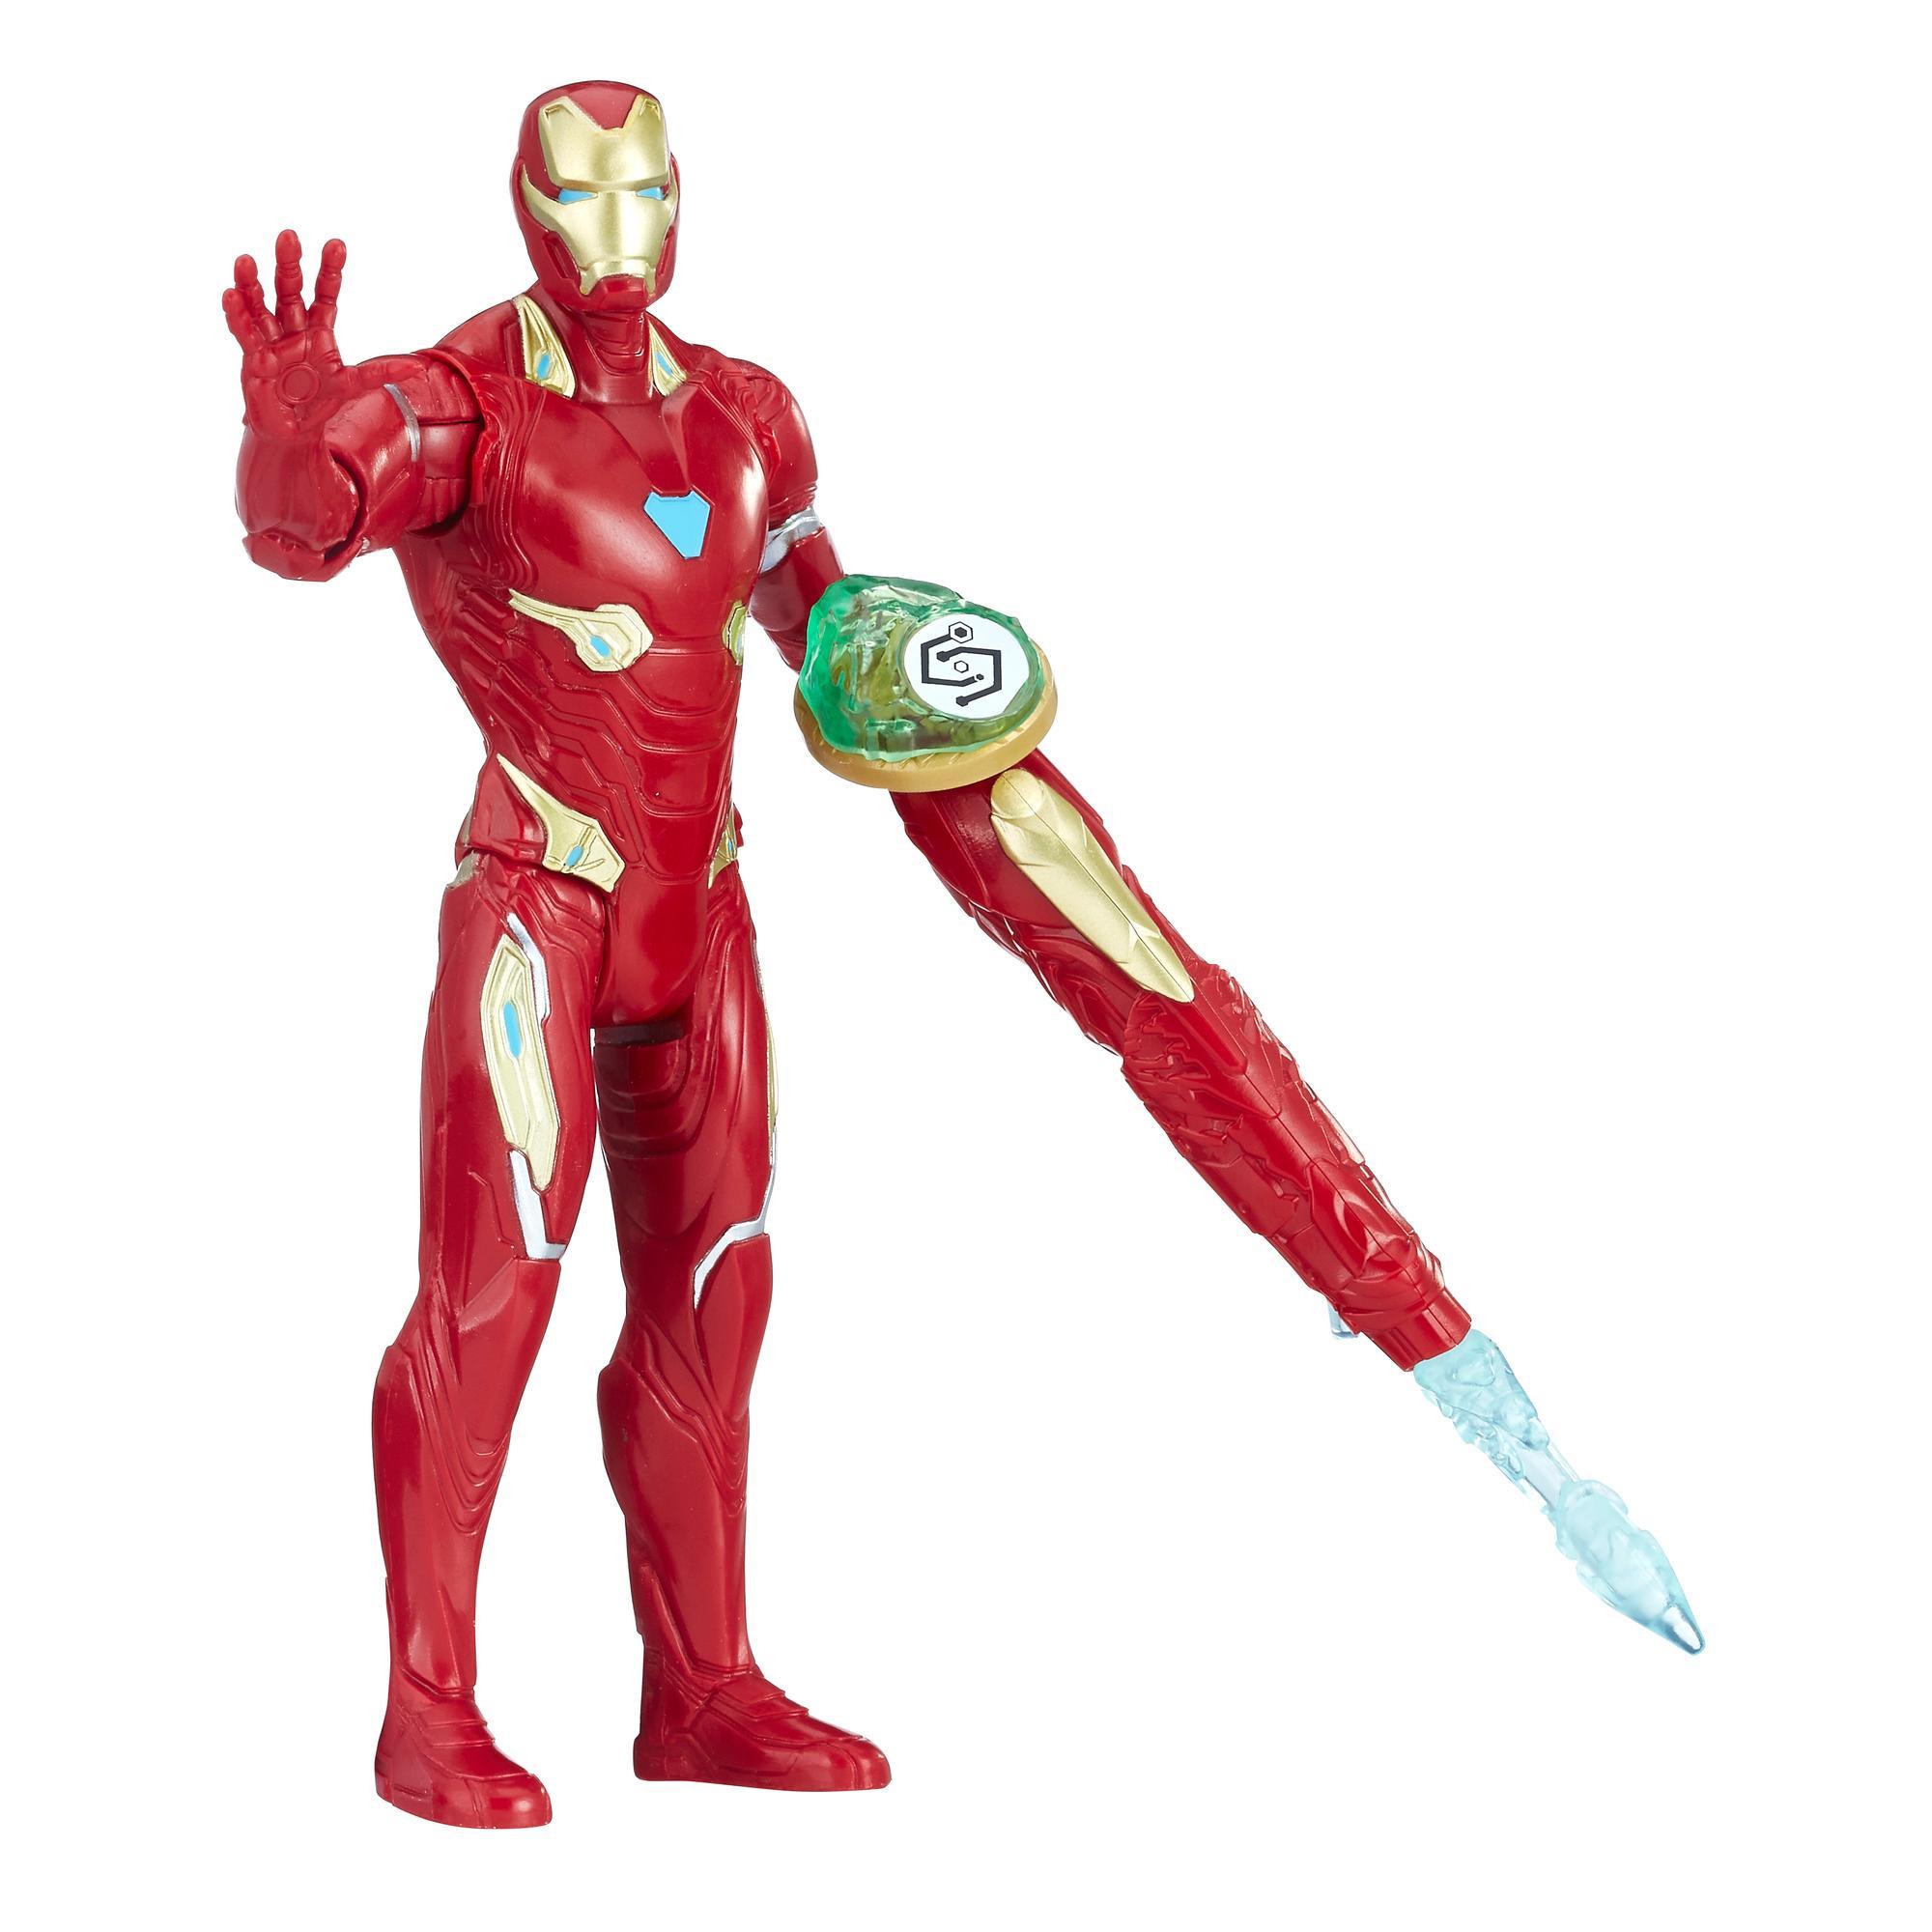 Marvel Avengers: Infinity War Iron Man